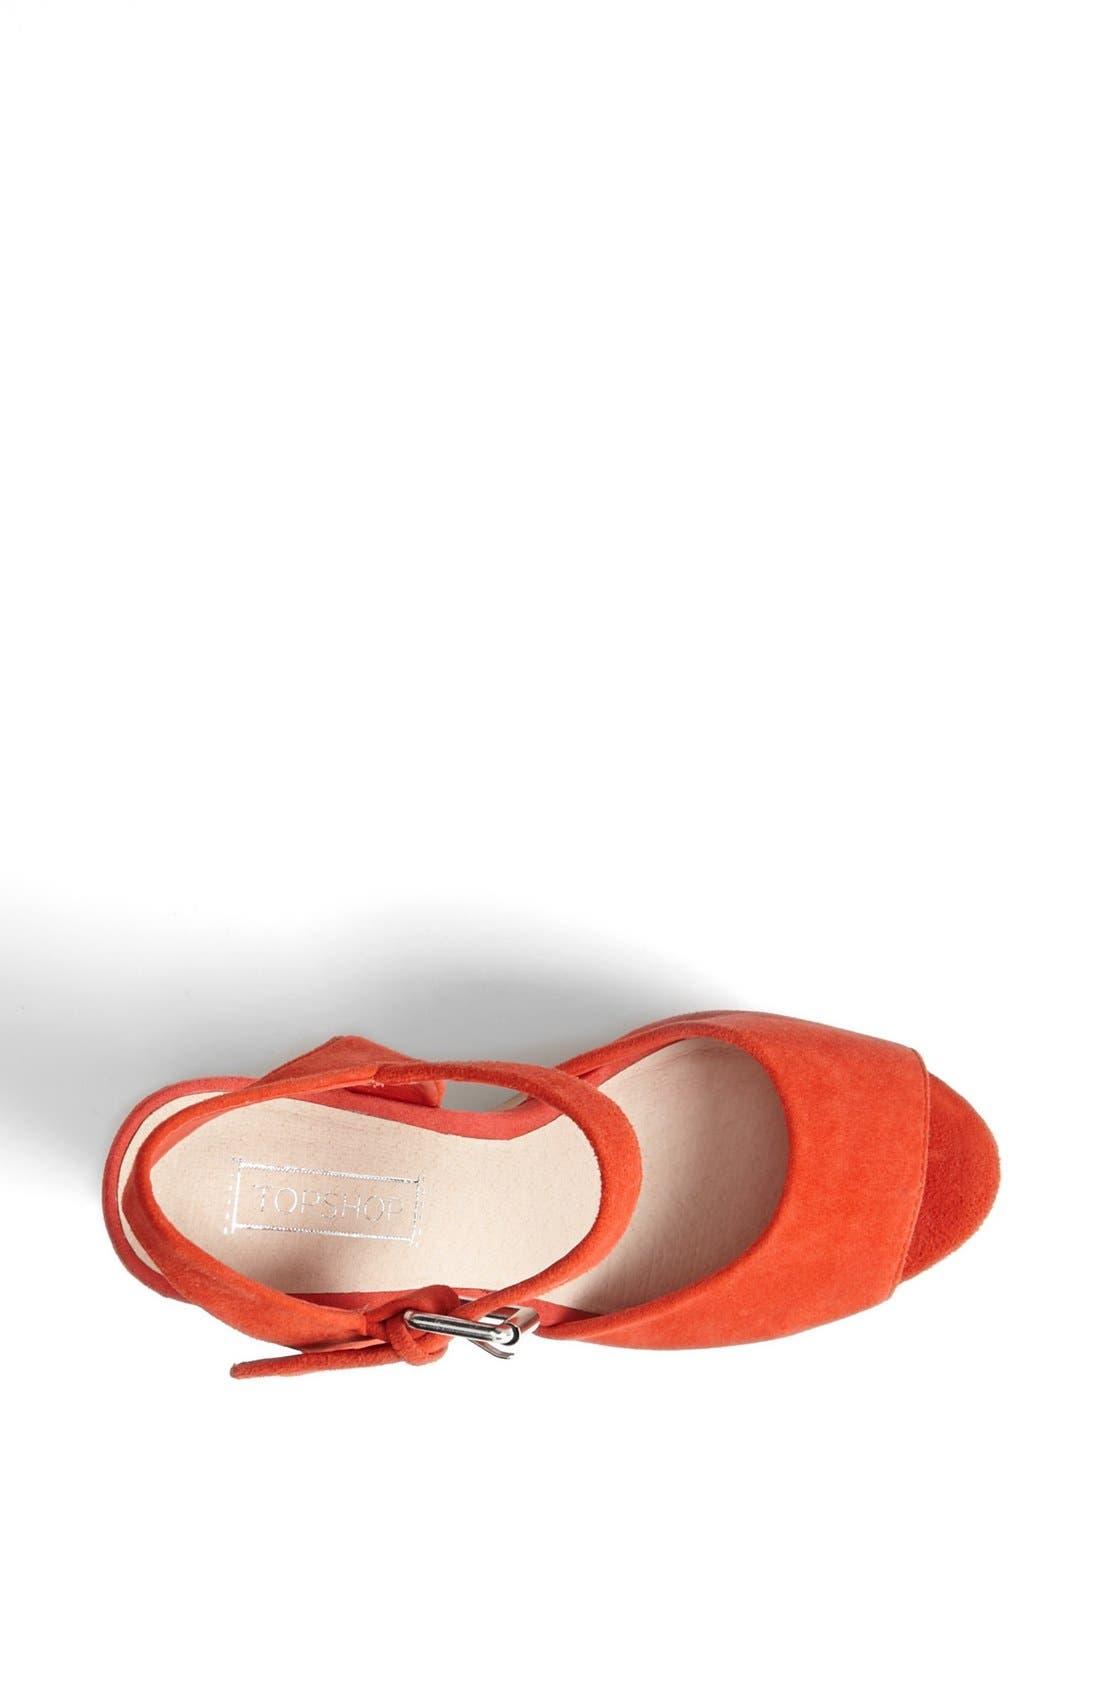 Alternate Image 3  - Topshop 'Lassie' Platform Sandal